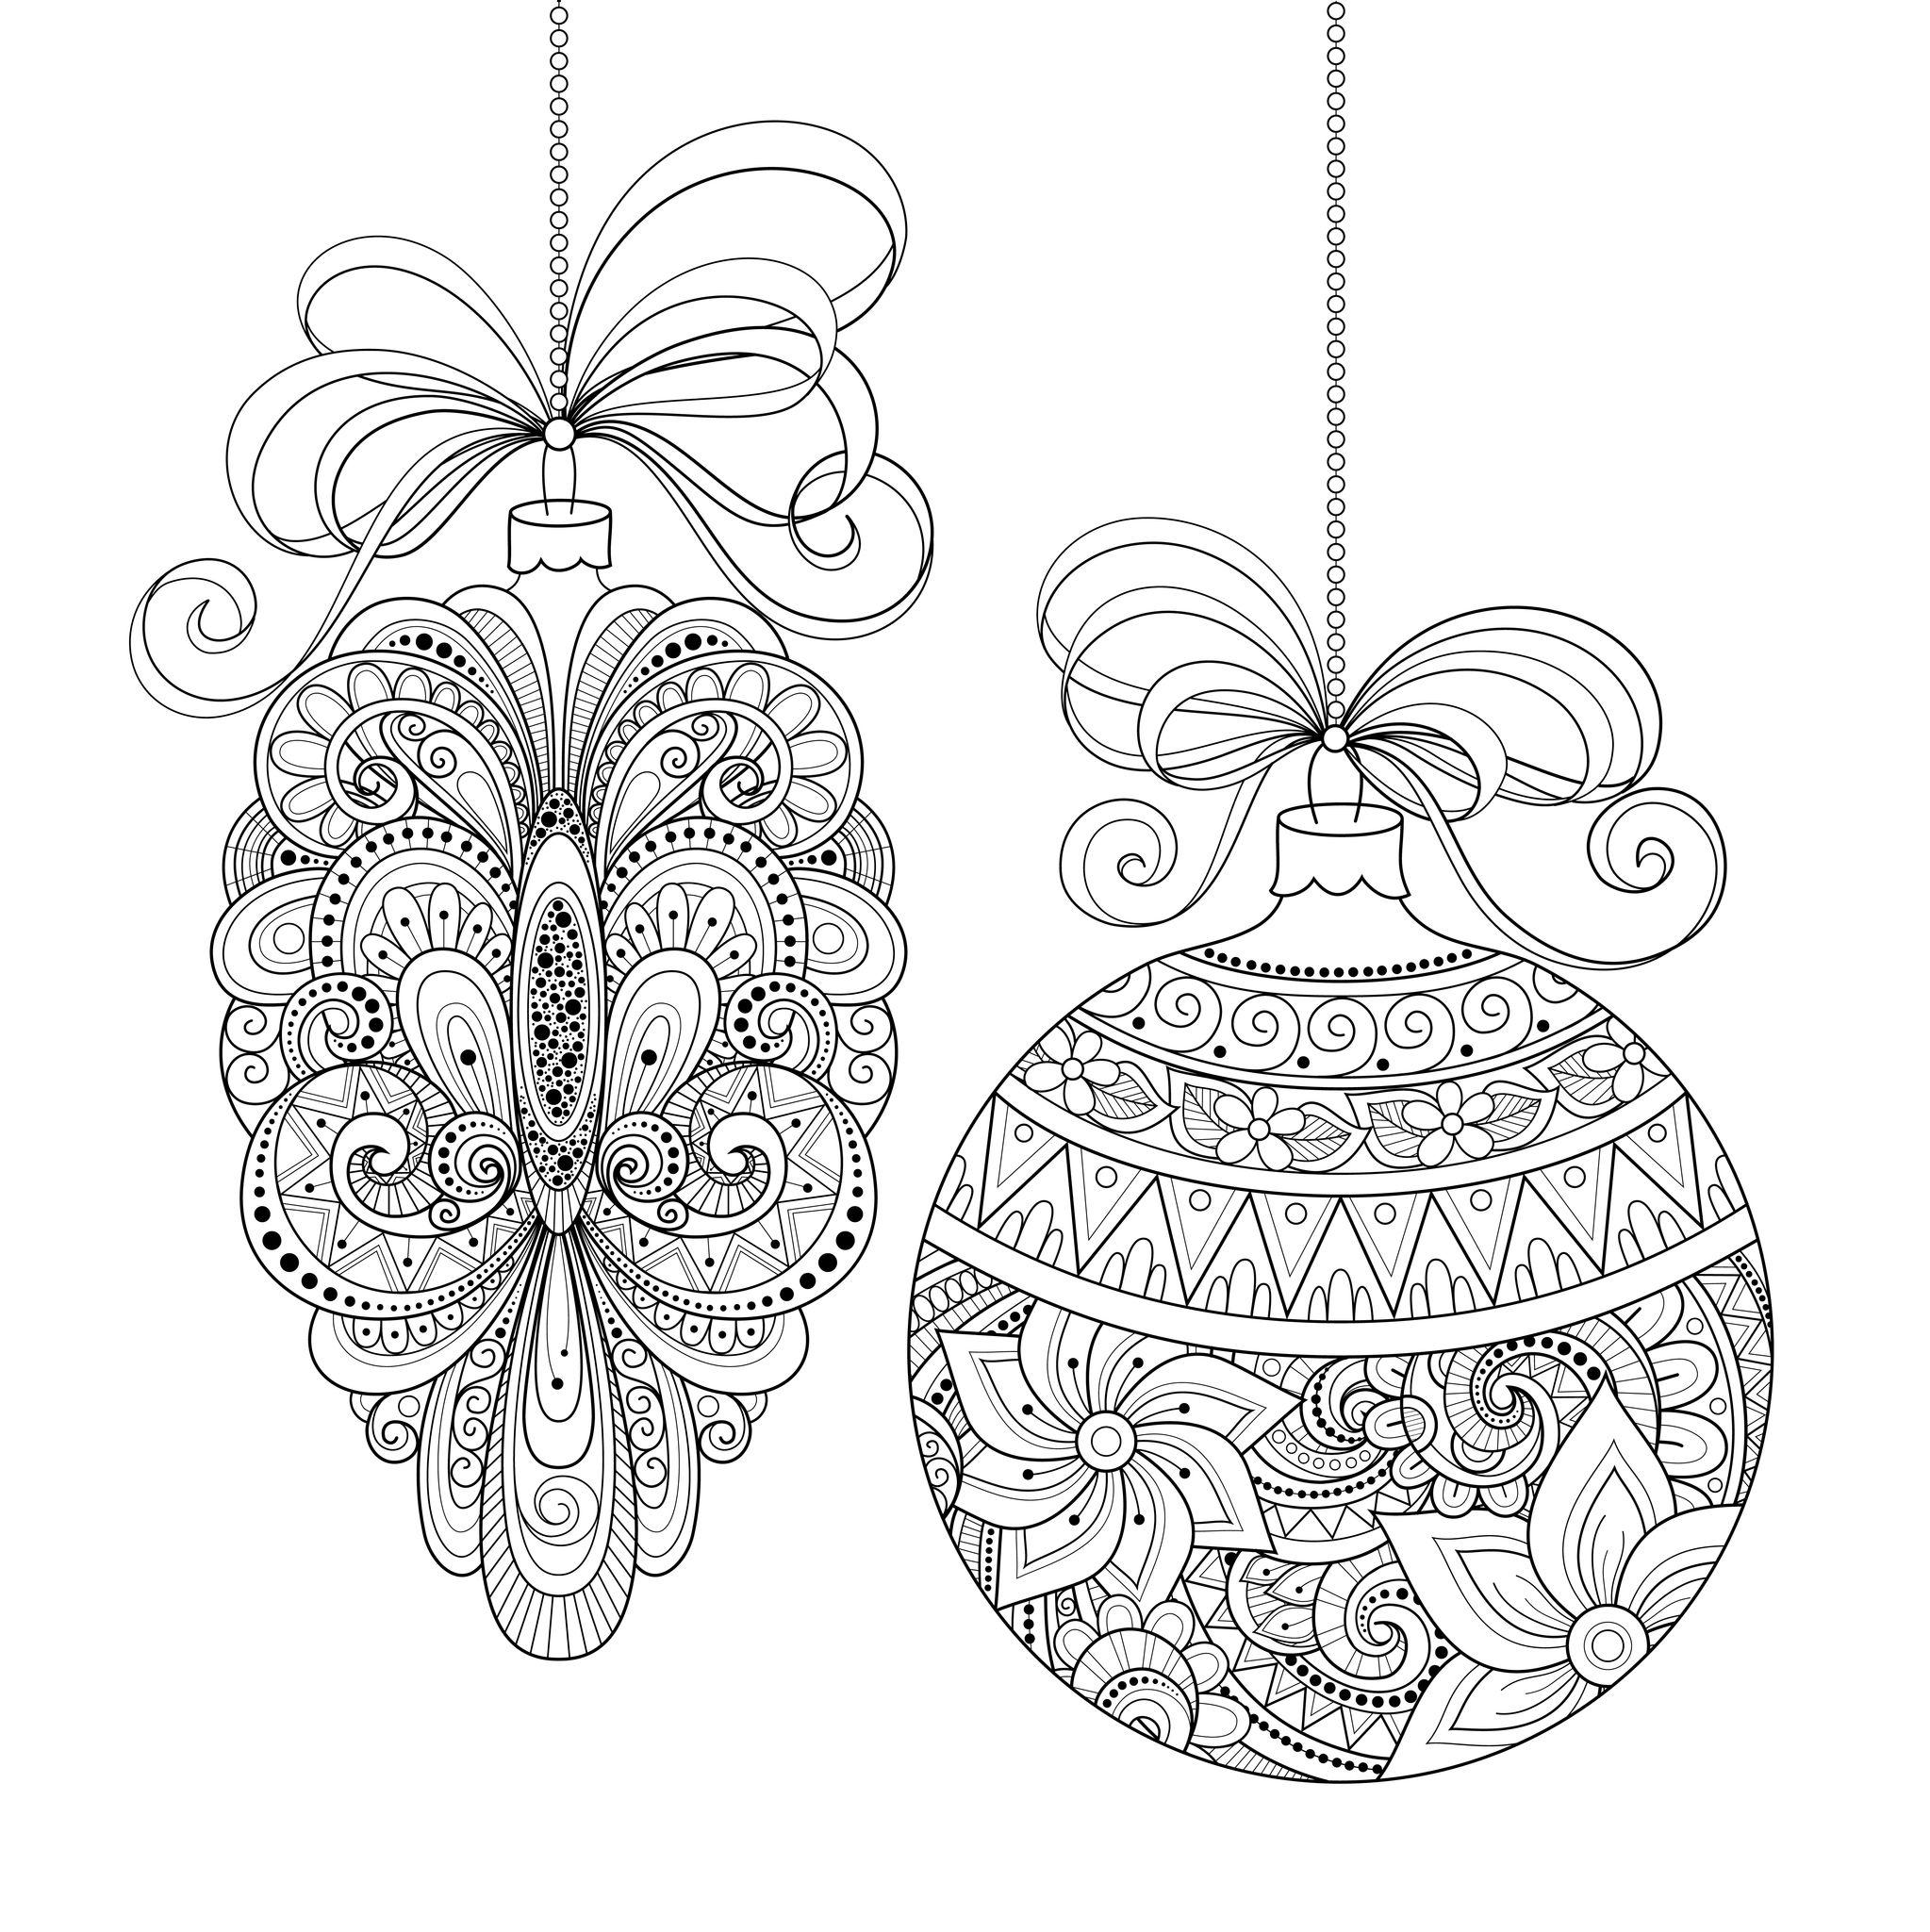 Drawn christmas ornaments christmas greeting card  ornaments make Christmas make